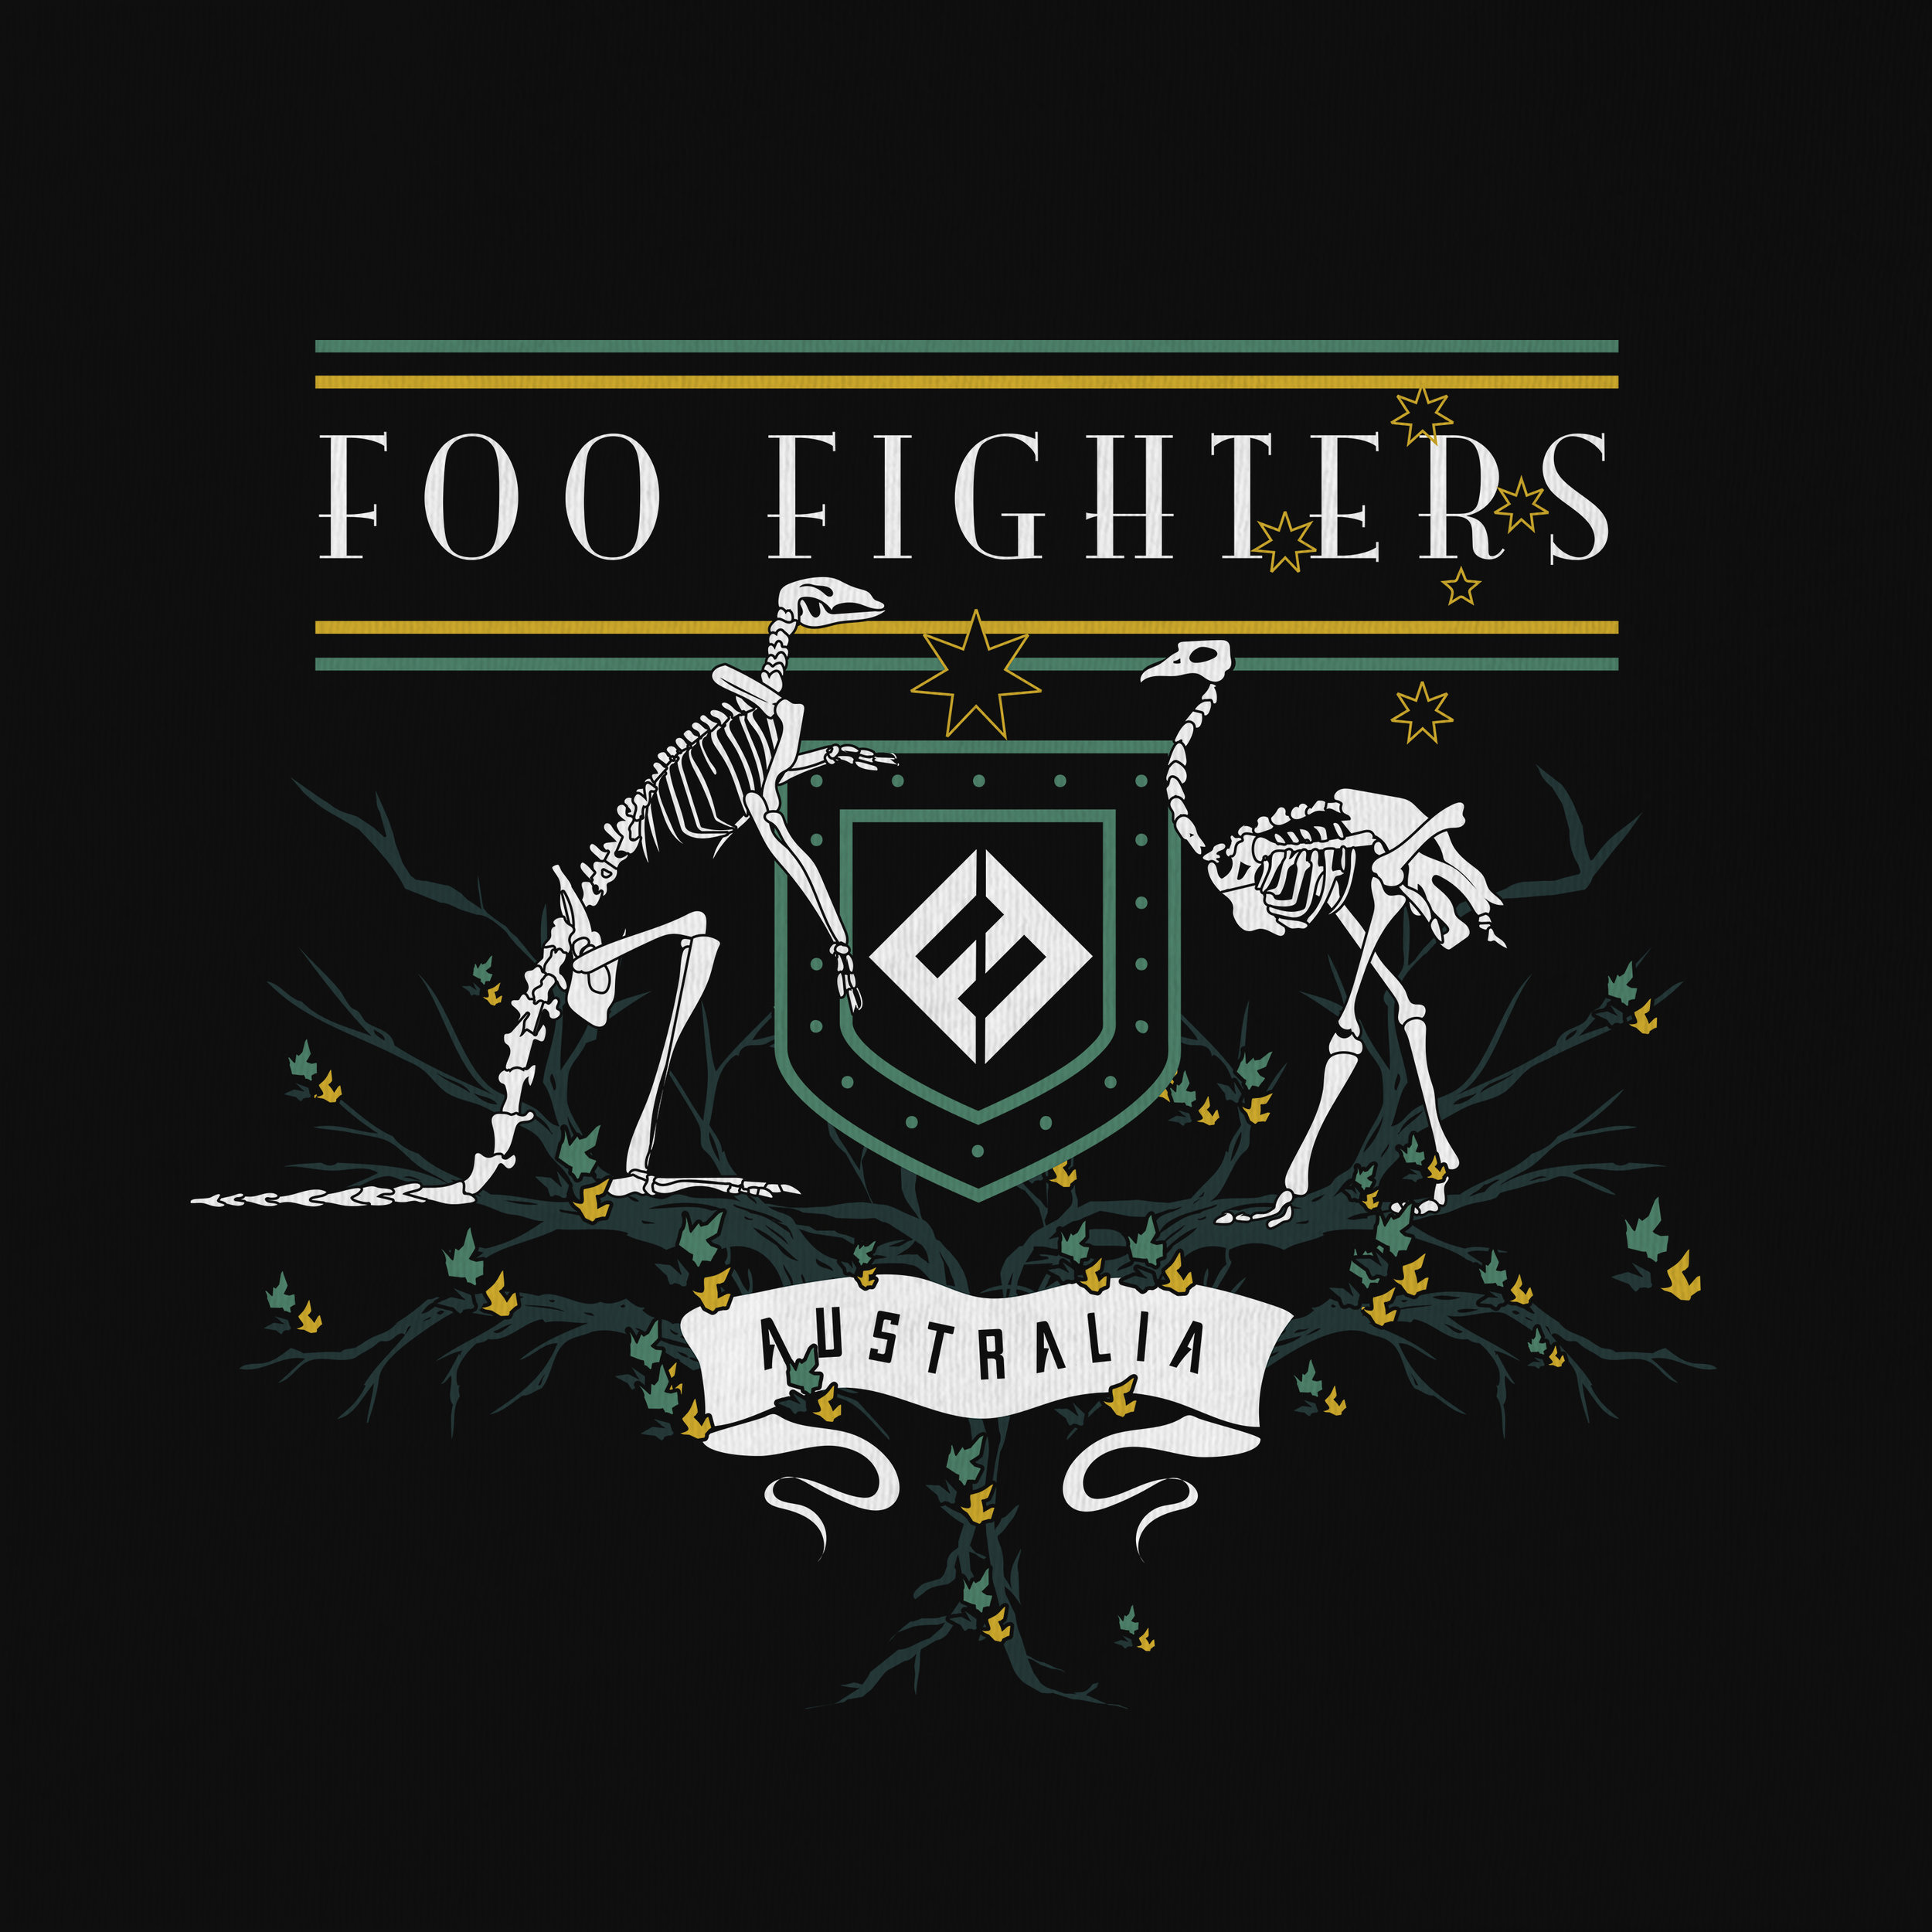 foo-fighters-australia.jpg